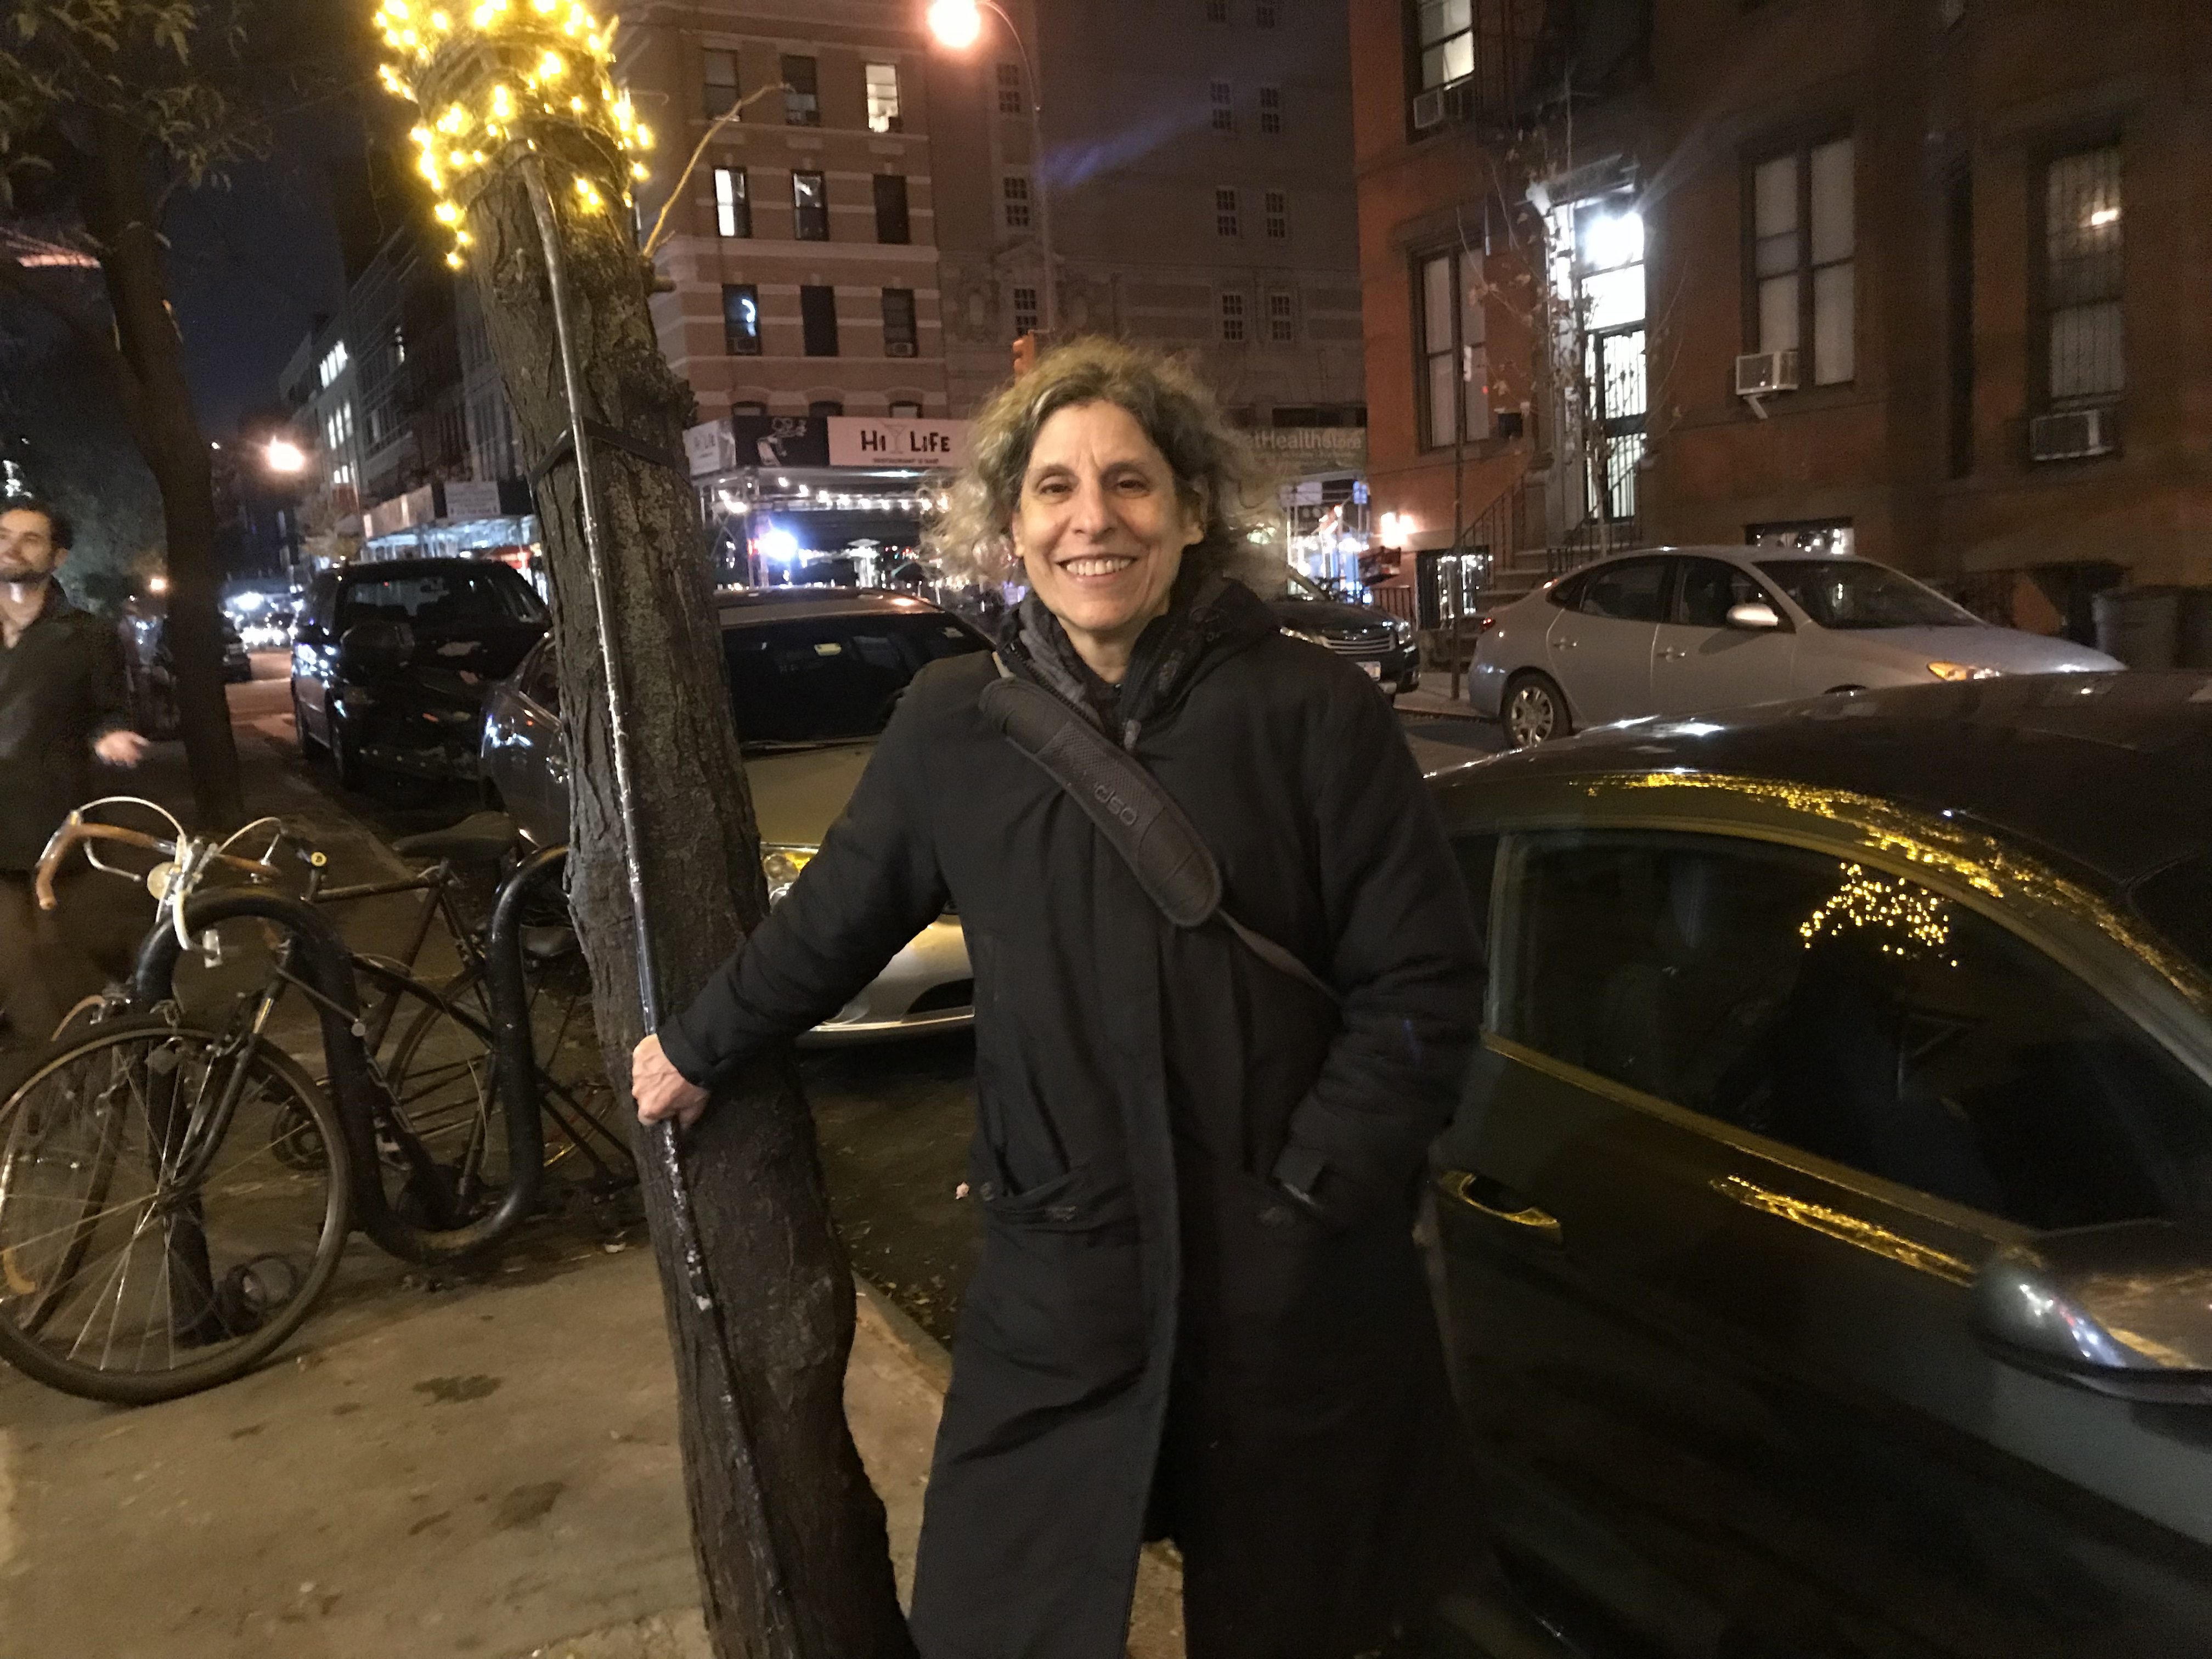 Sharon, Professor, Upper West Side